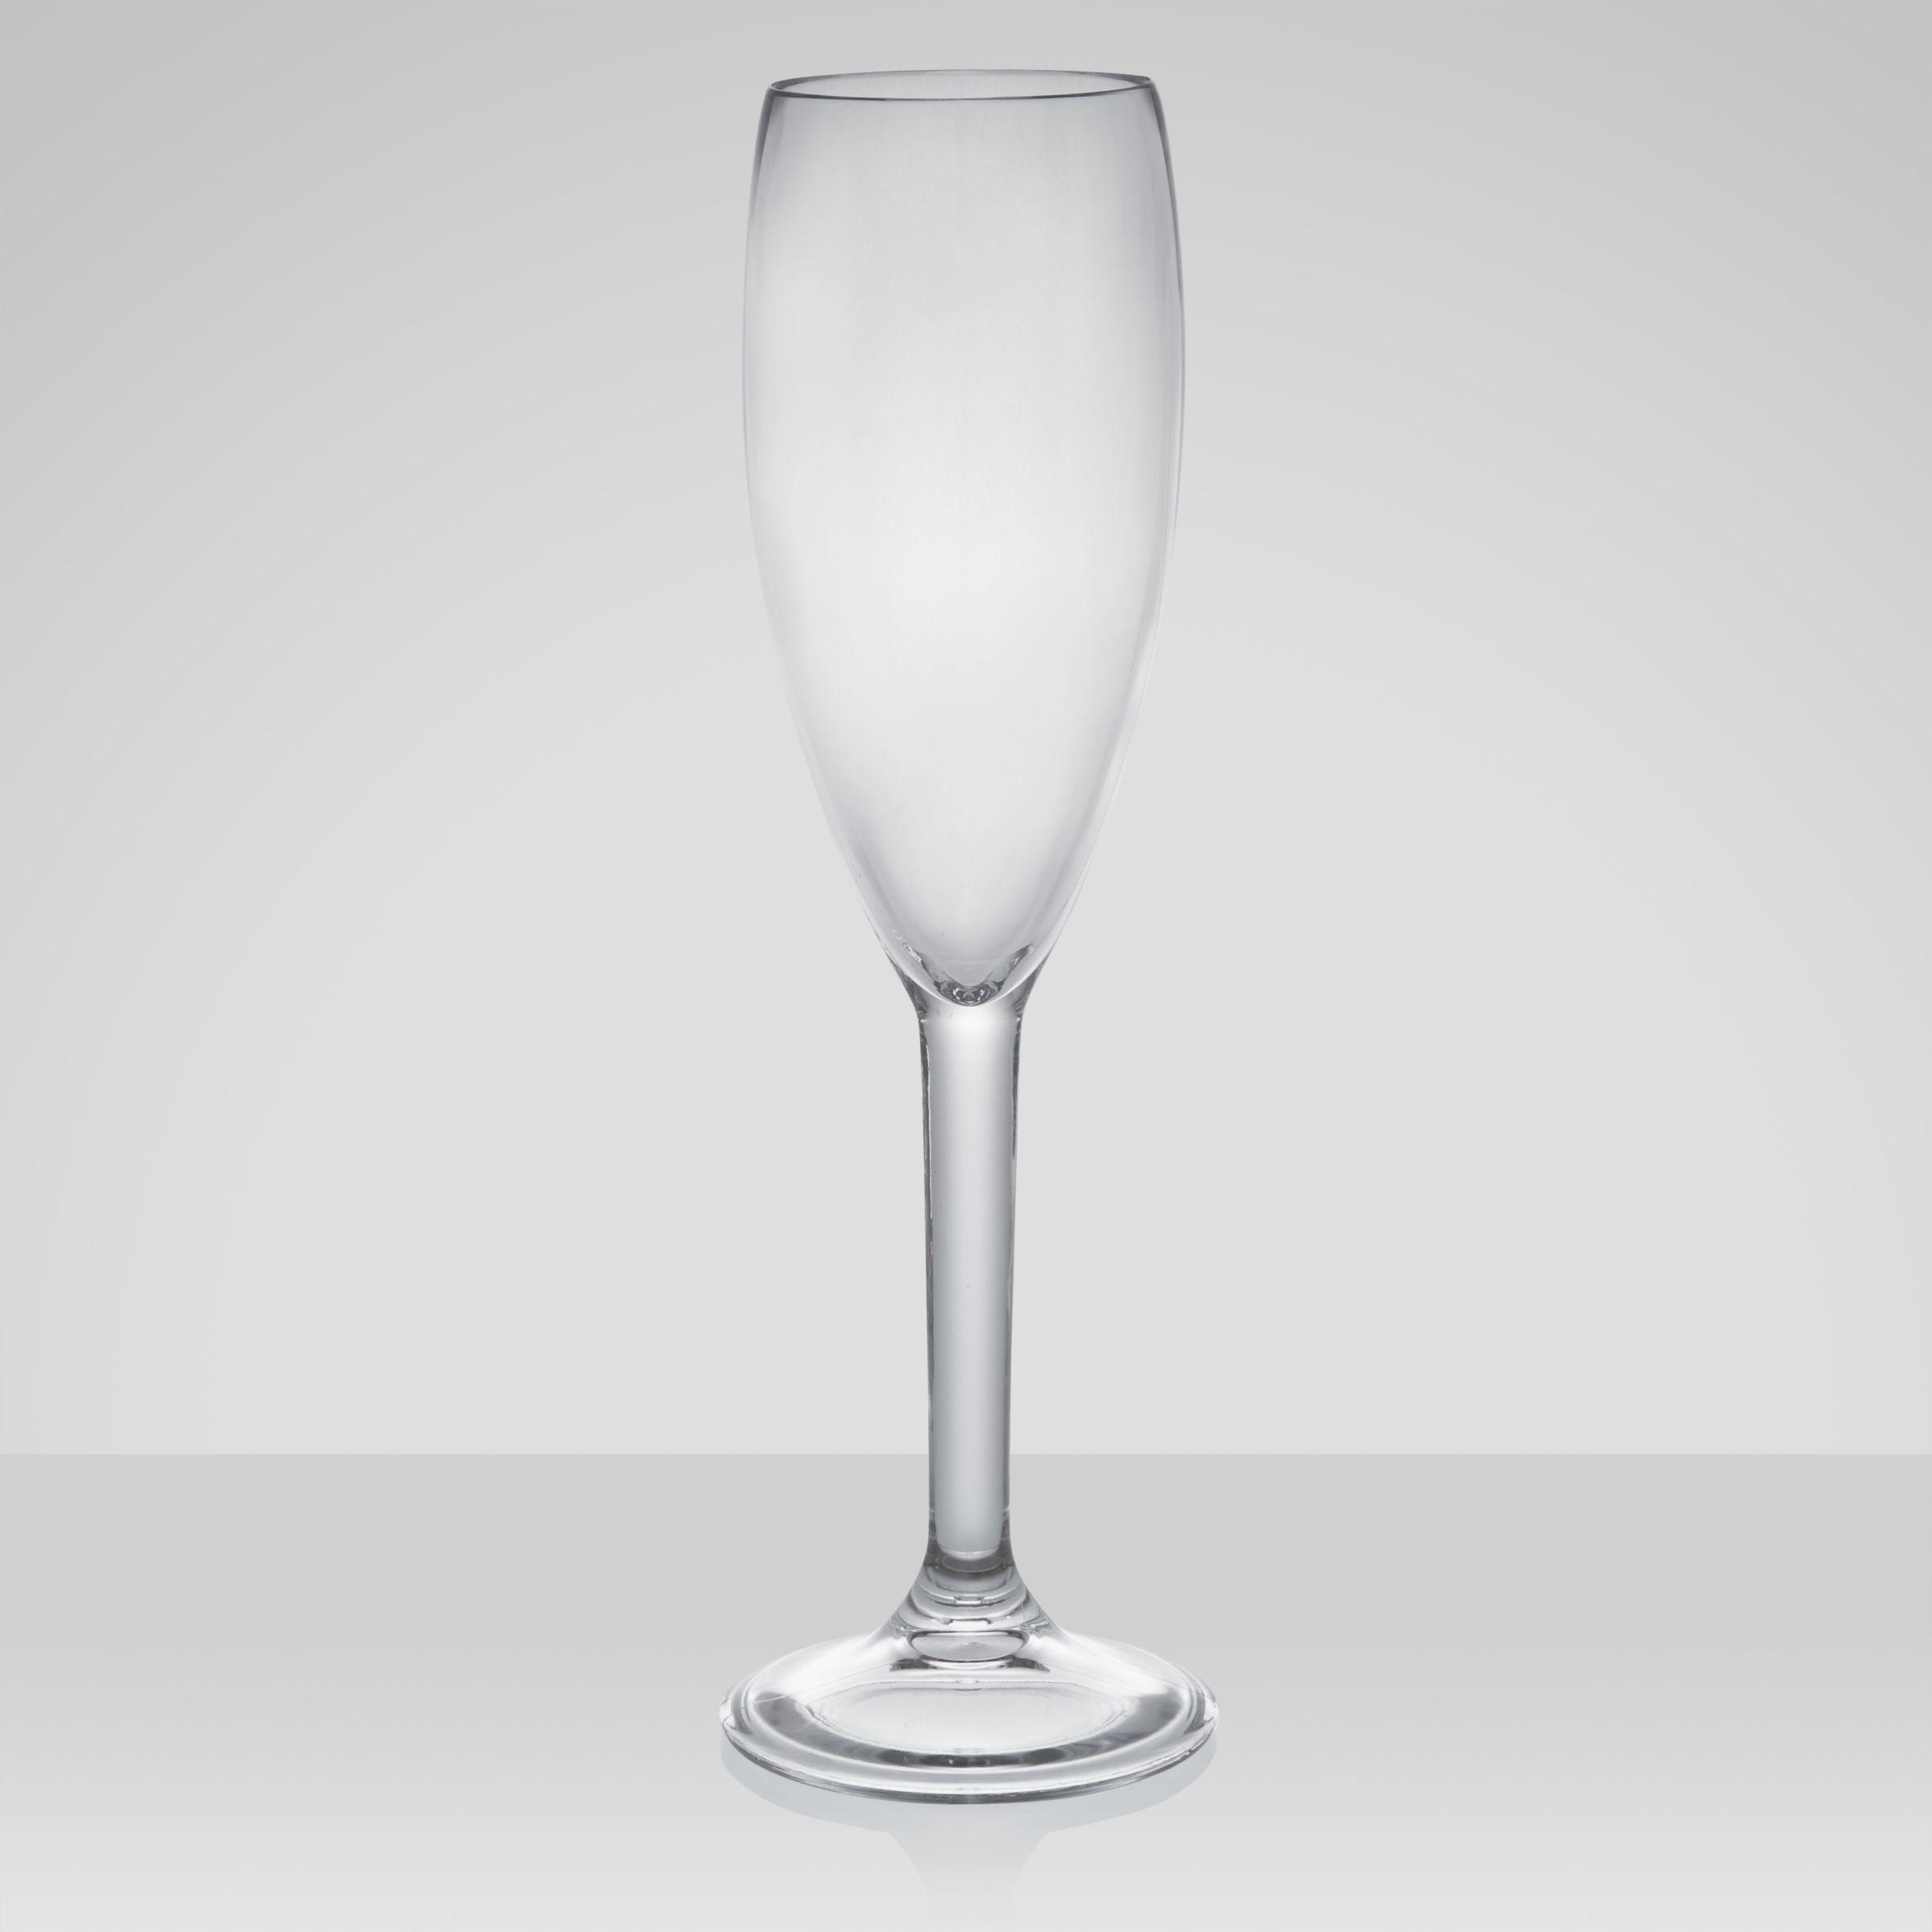 John Lewis Acrylic Champagne Flute, 0.18L, Set of 4